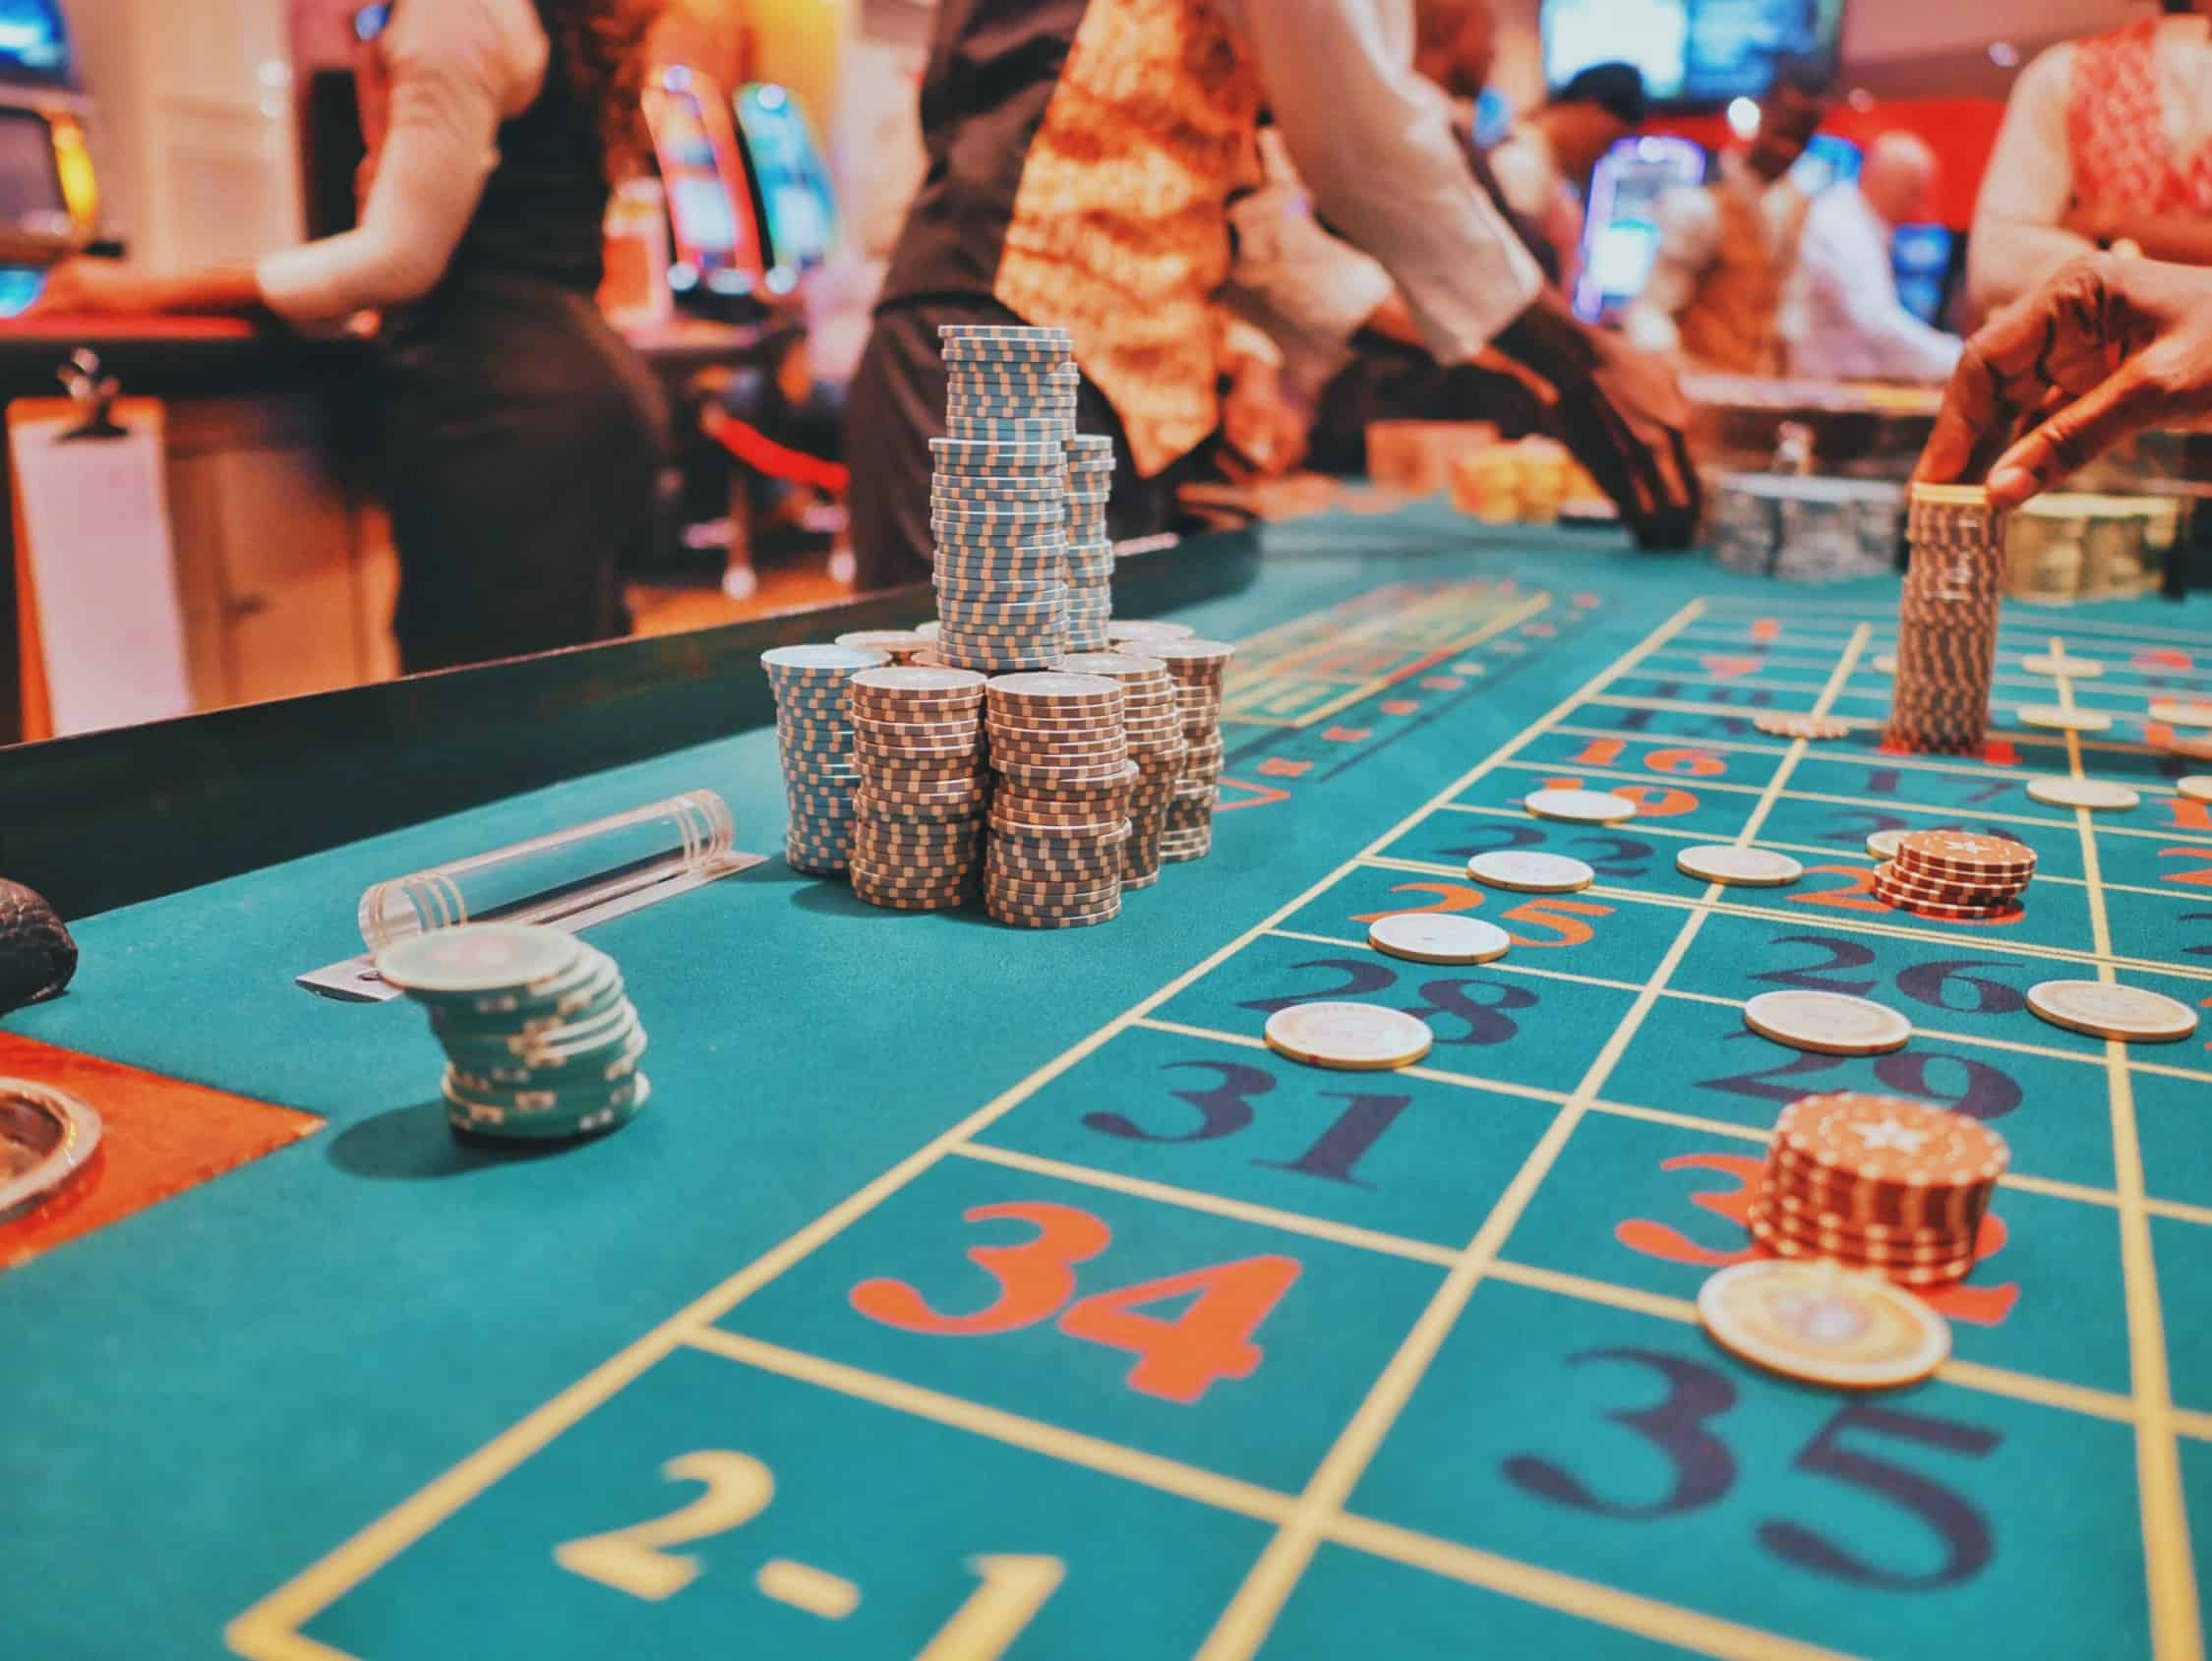 Cheap Digital Marketing For Casinos